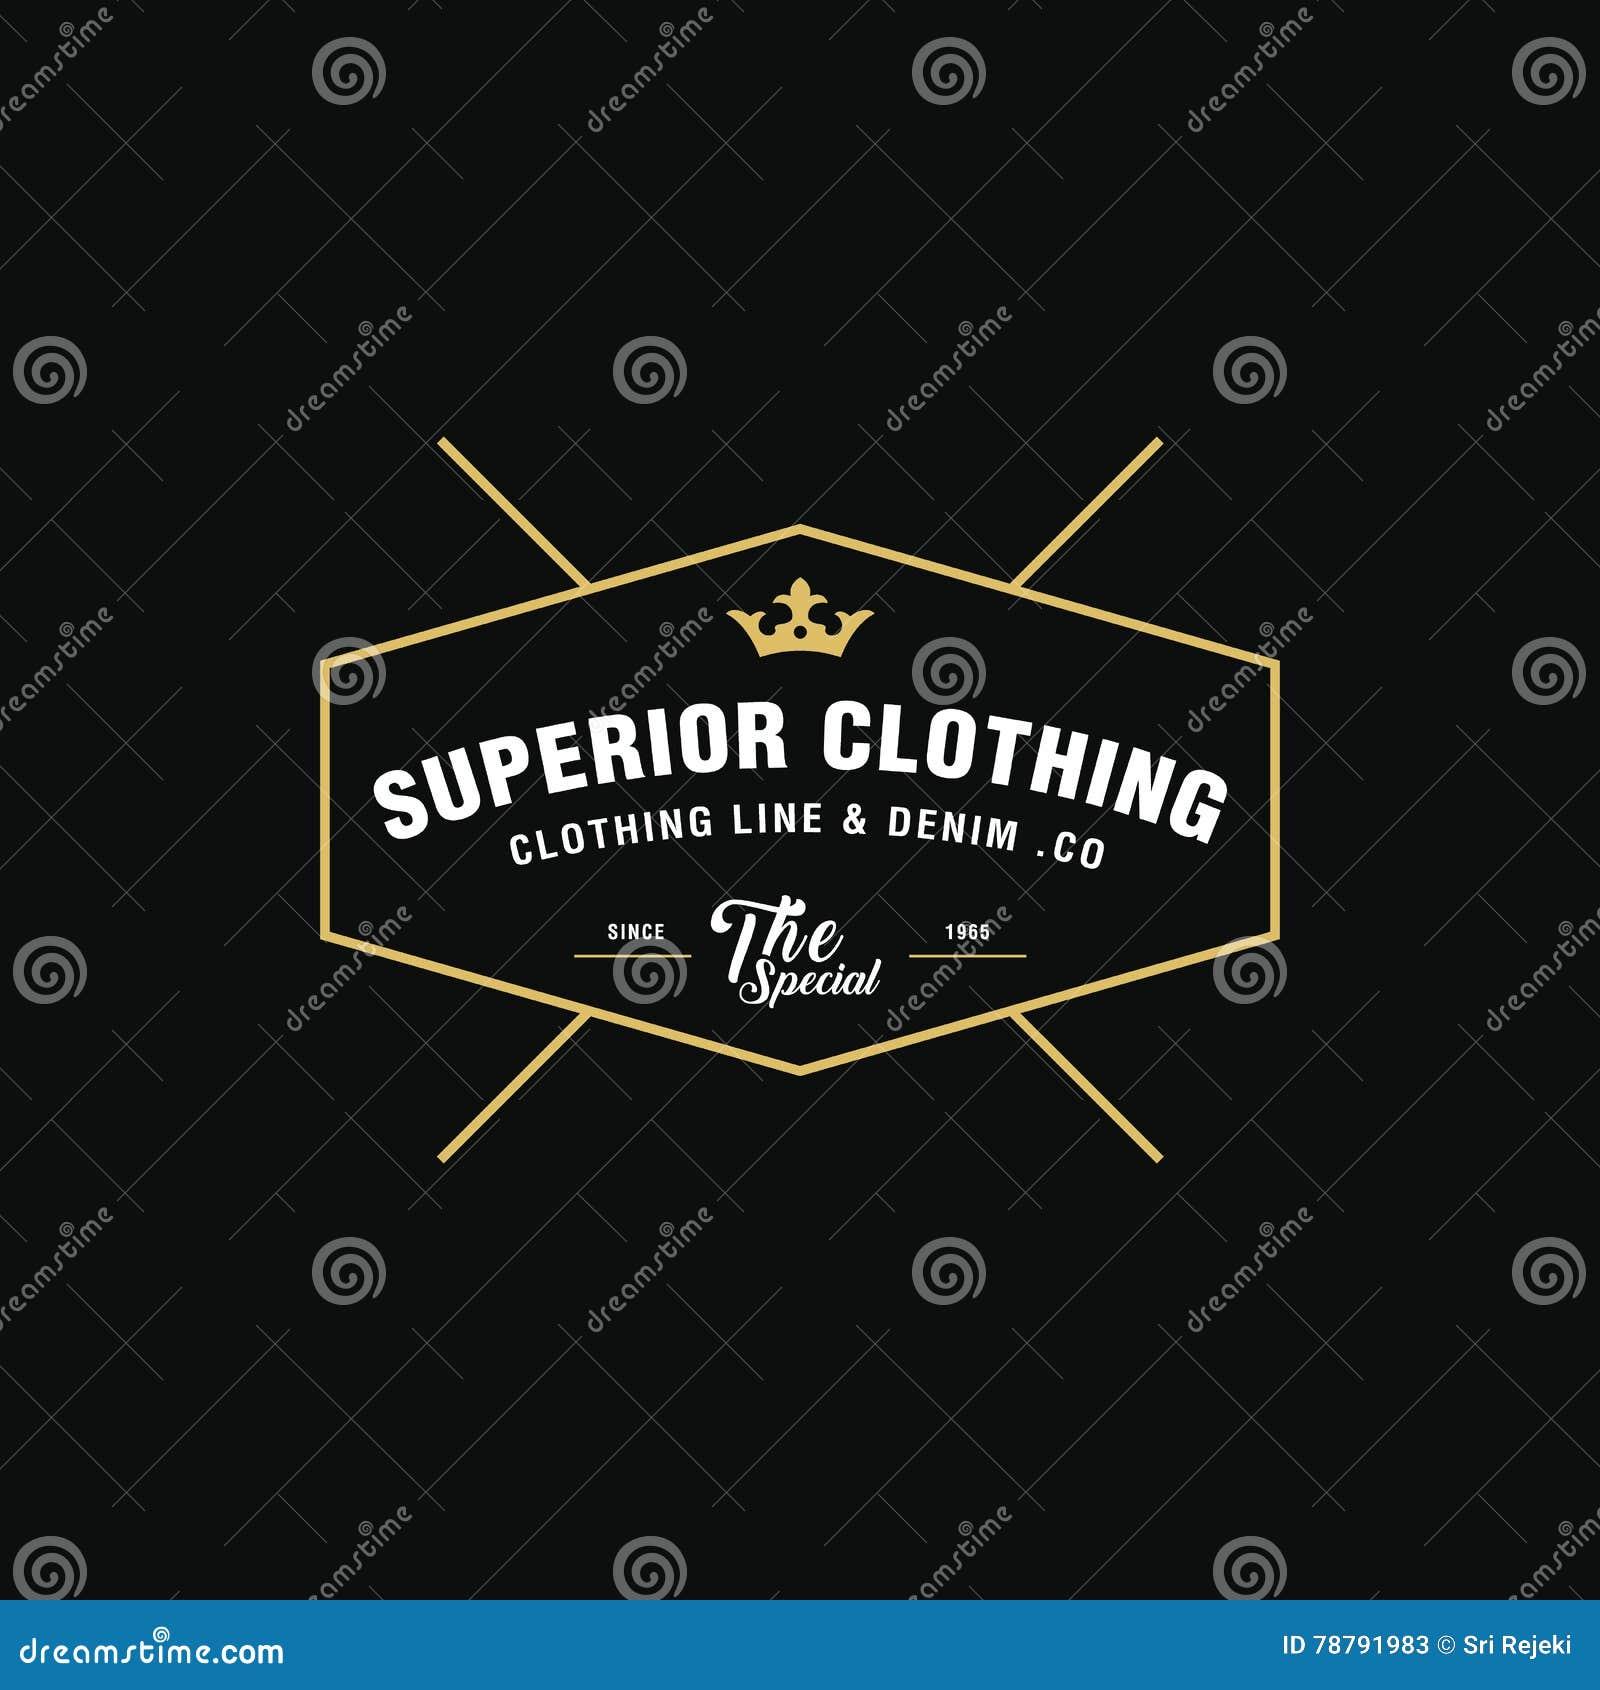 a5e2189c28d Vintage Denim Jeans Frame Logo. Classical Clothing Line Label. Stock ...